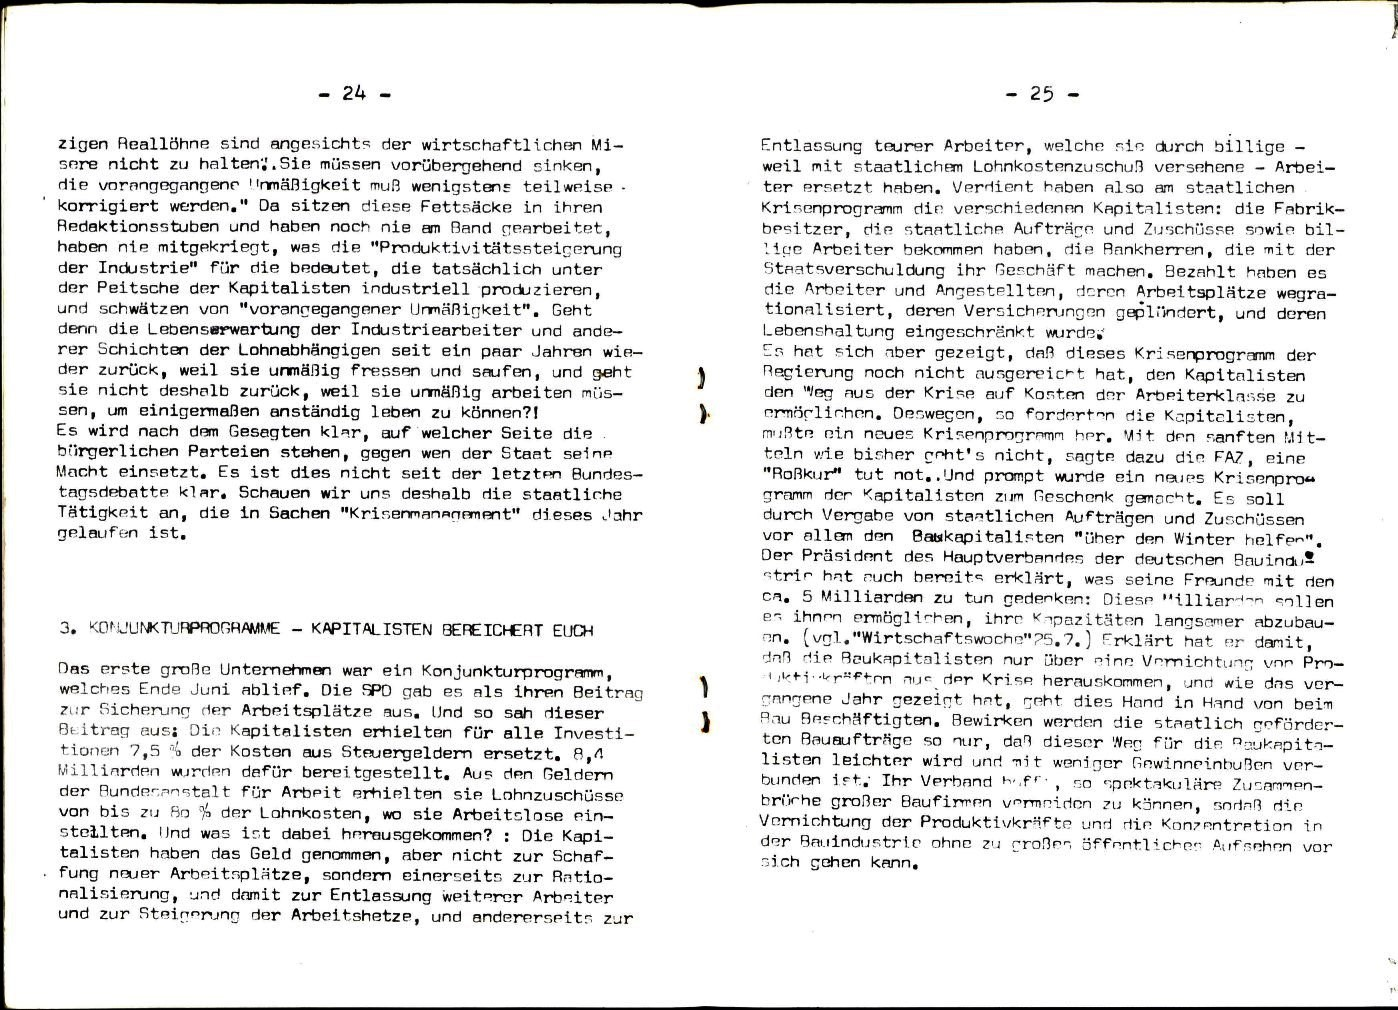 Aachen_KHI_1975_Krise_13